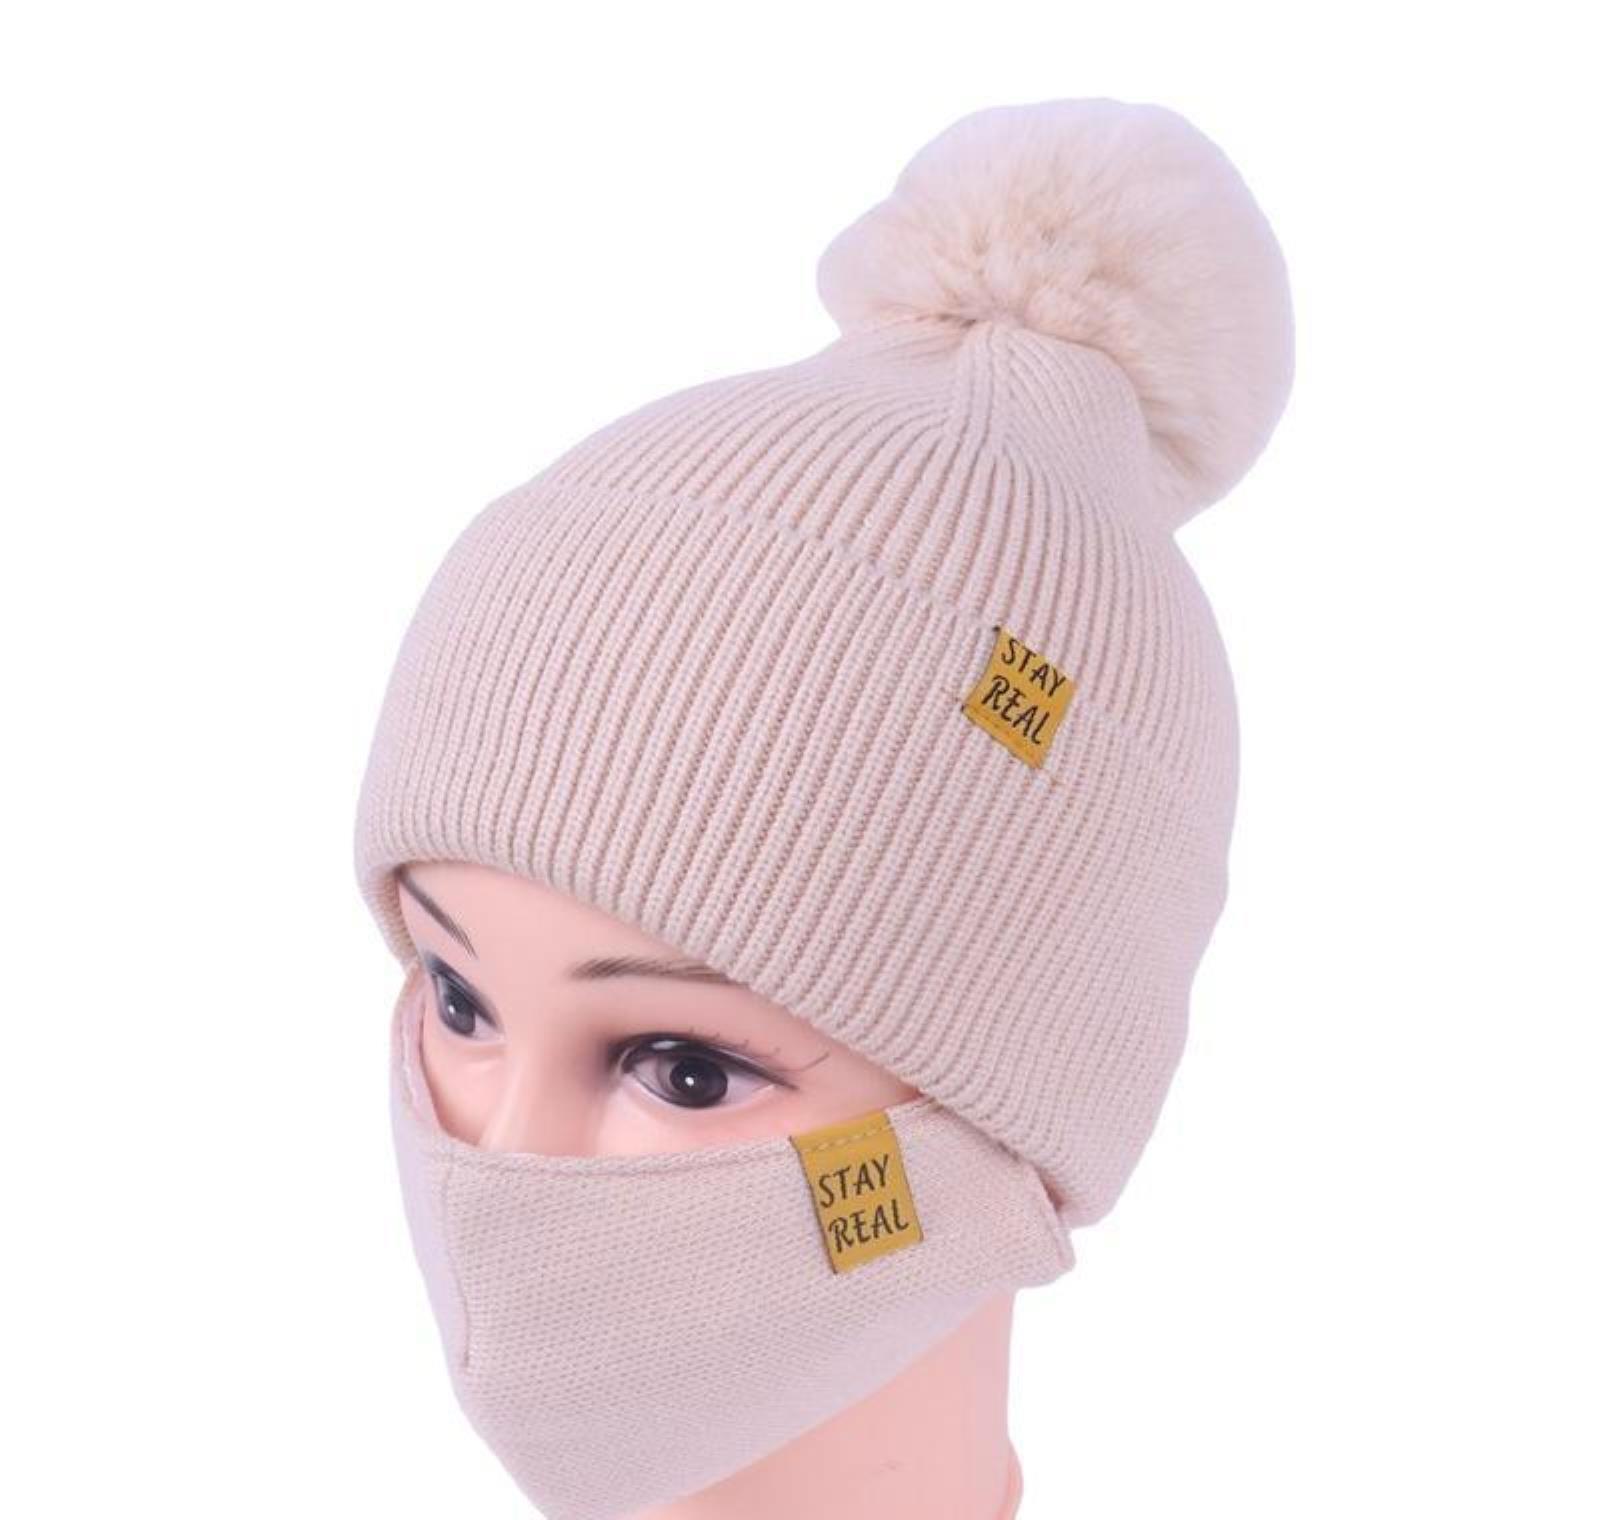 DHL envío para mujer chicas de punto gorra gorra con máscara facial set suave cálido alineado de invierno pompón sombrero al aire libre jllngd sinabag